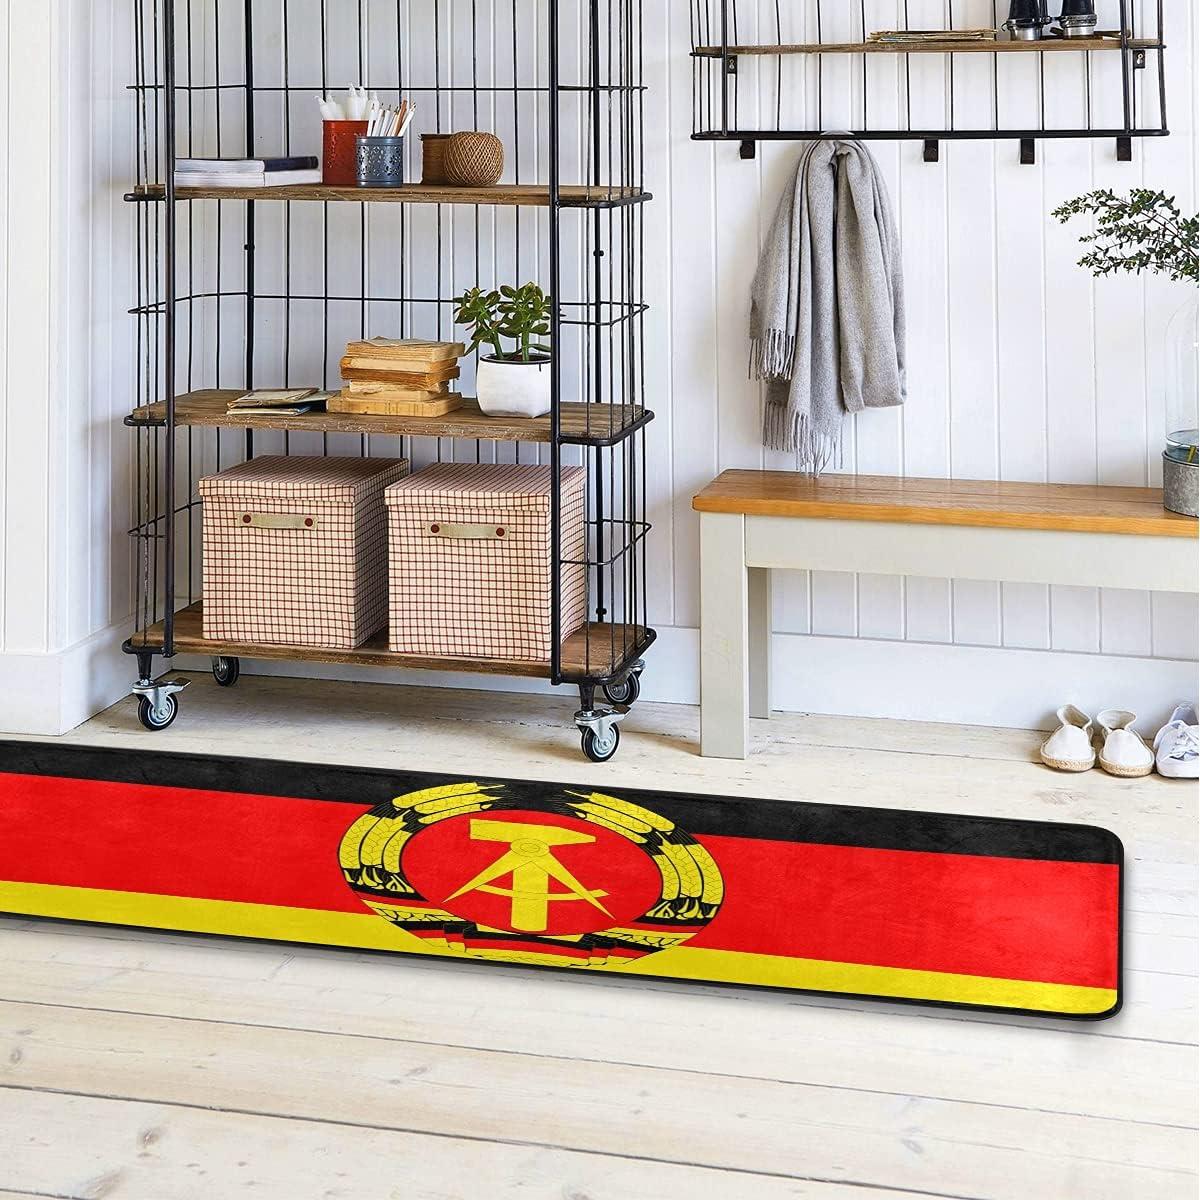 Indianapolis Mall Max 74% OFF MALPLENA East Germany Kitchen Runner Modern Rug 72x24